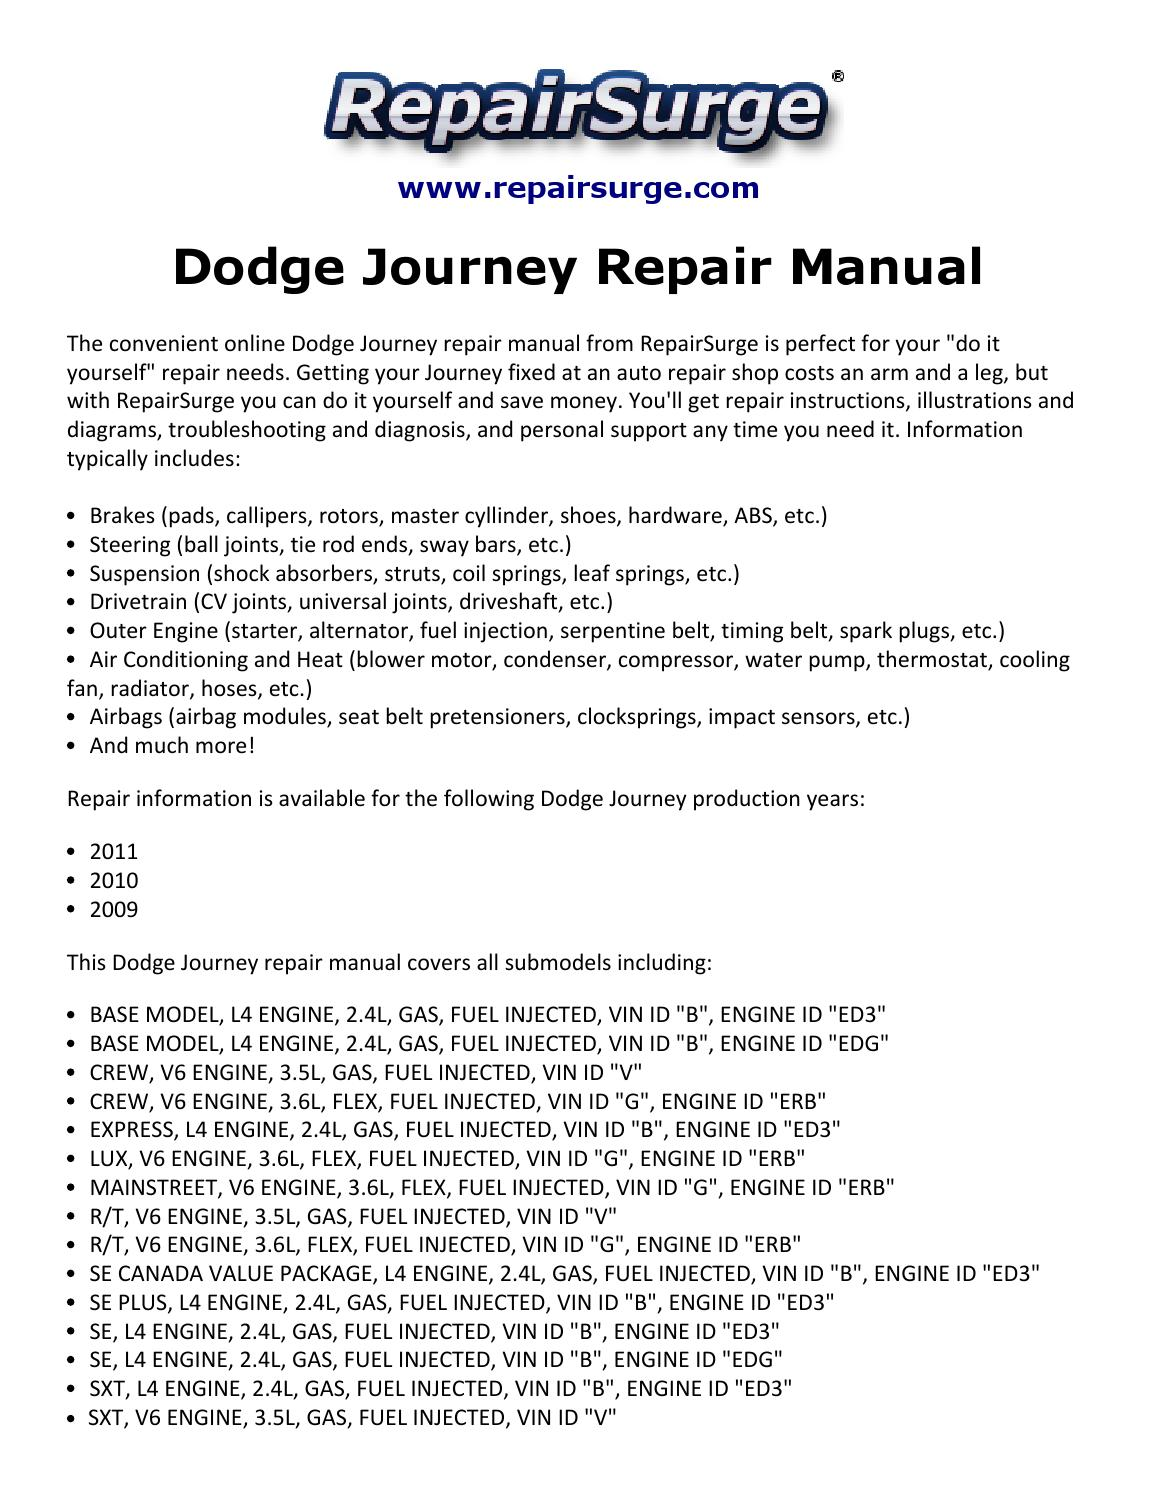 Dodge Journey Repair Manual 2009 2011 By Stuart Hemple Issuu